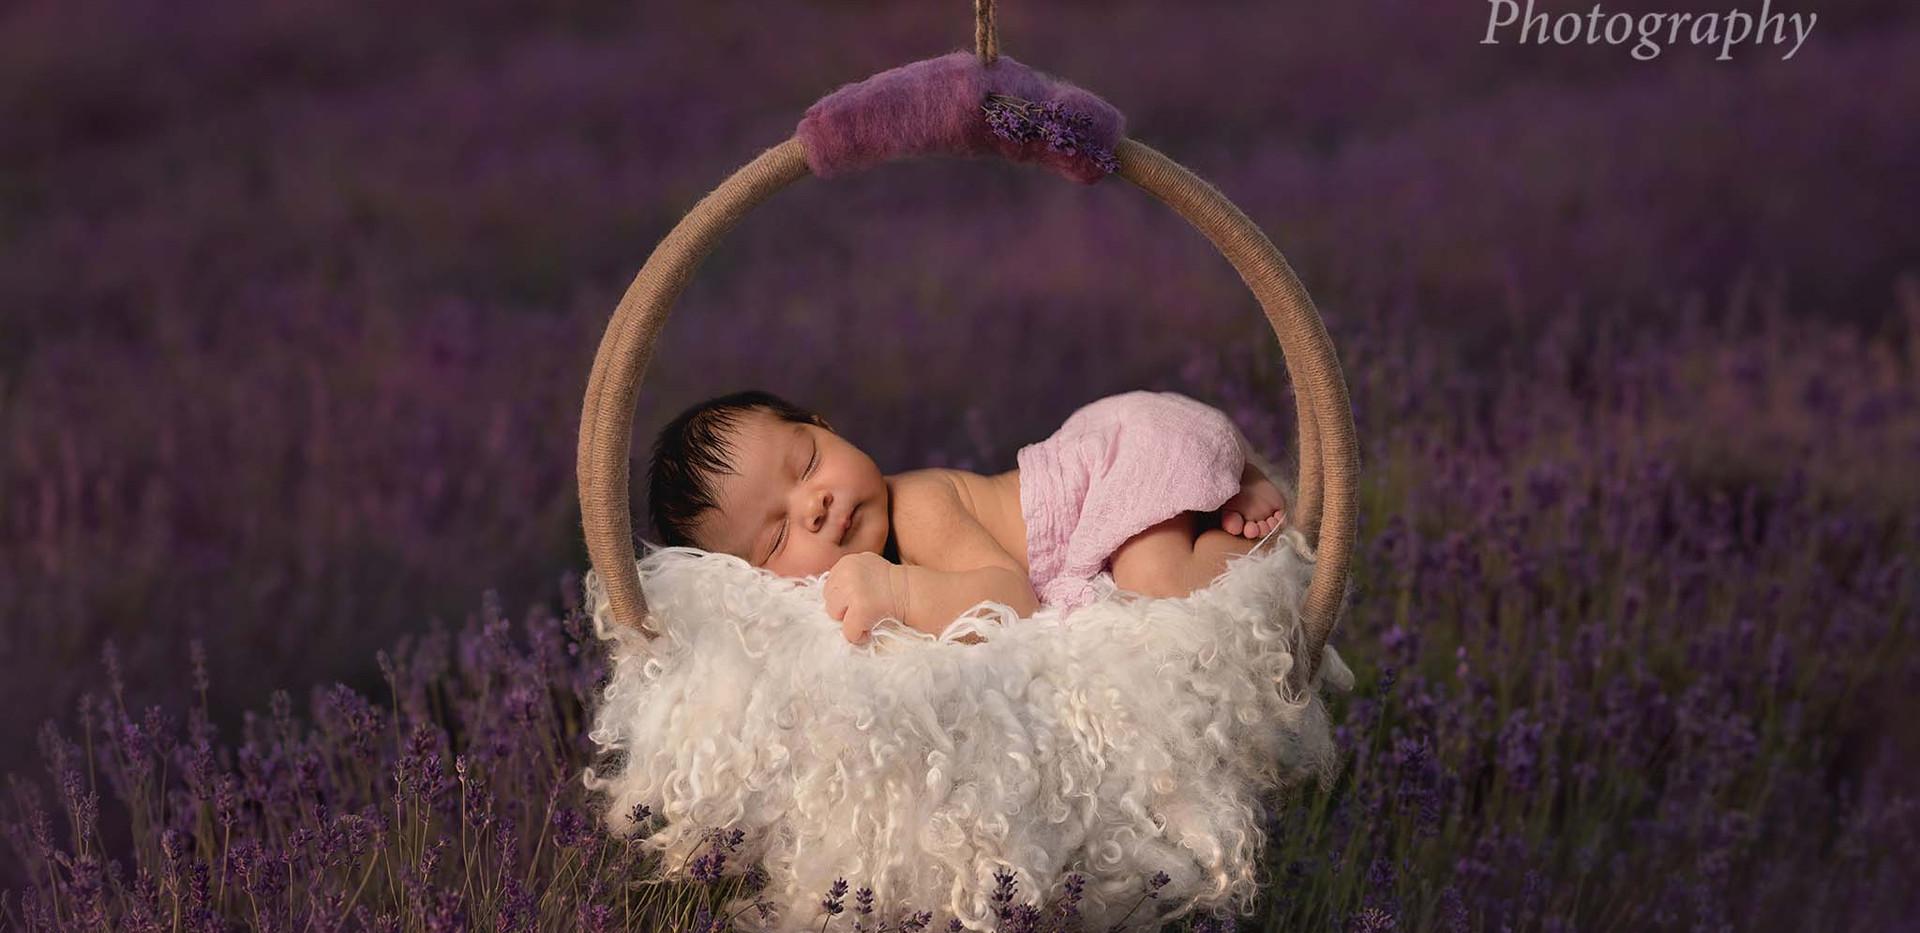 Lavender Baby